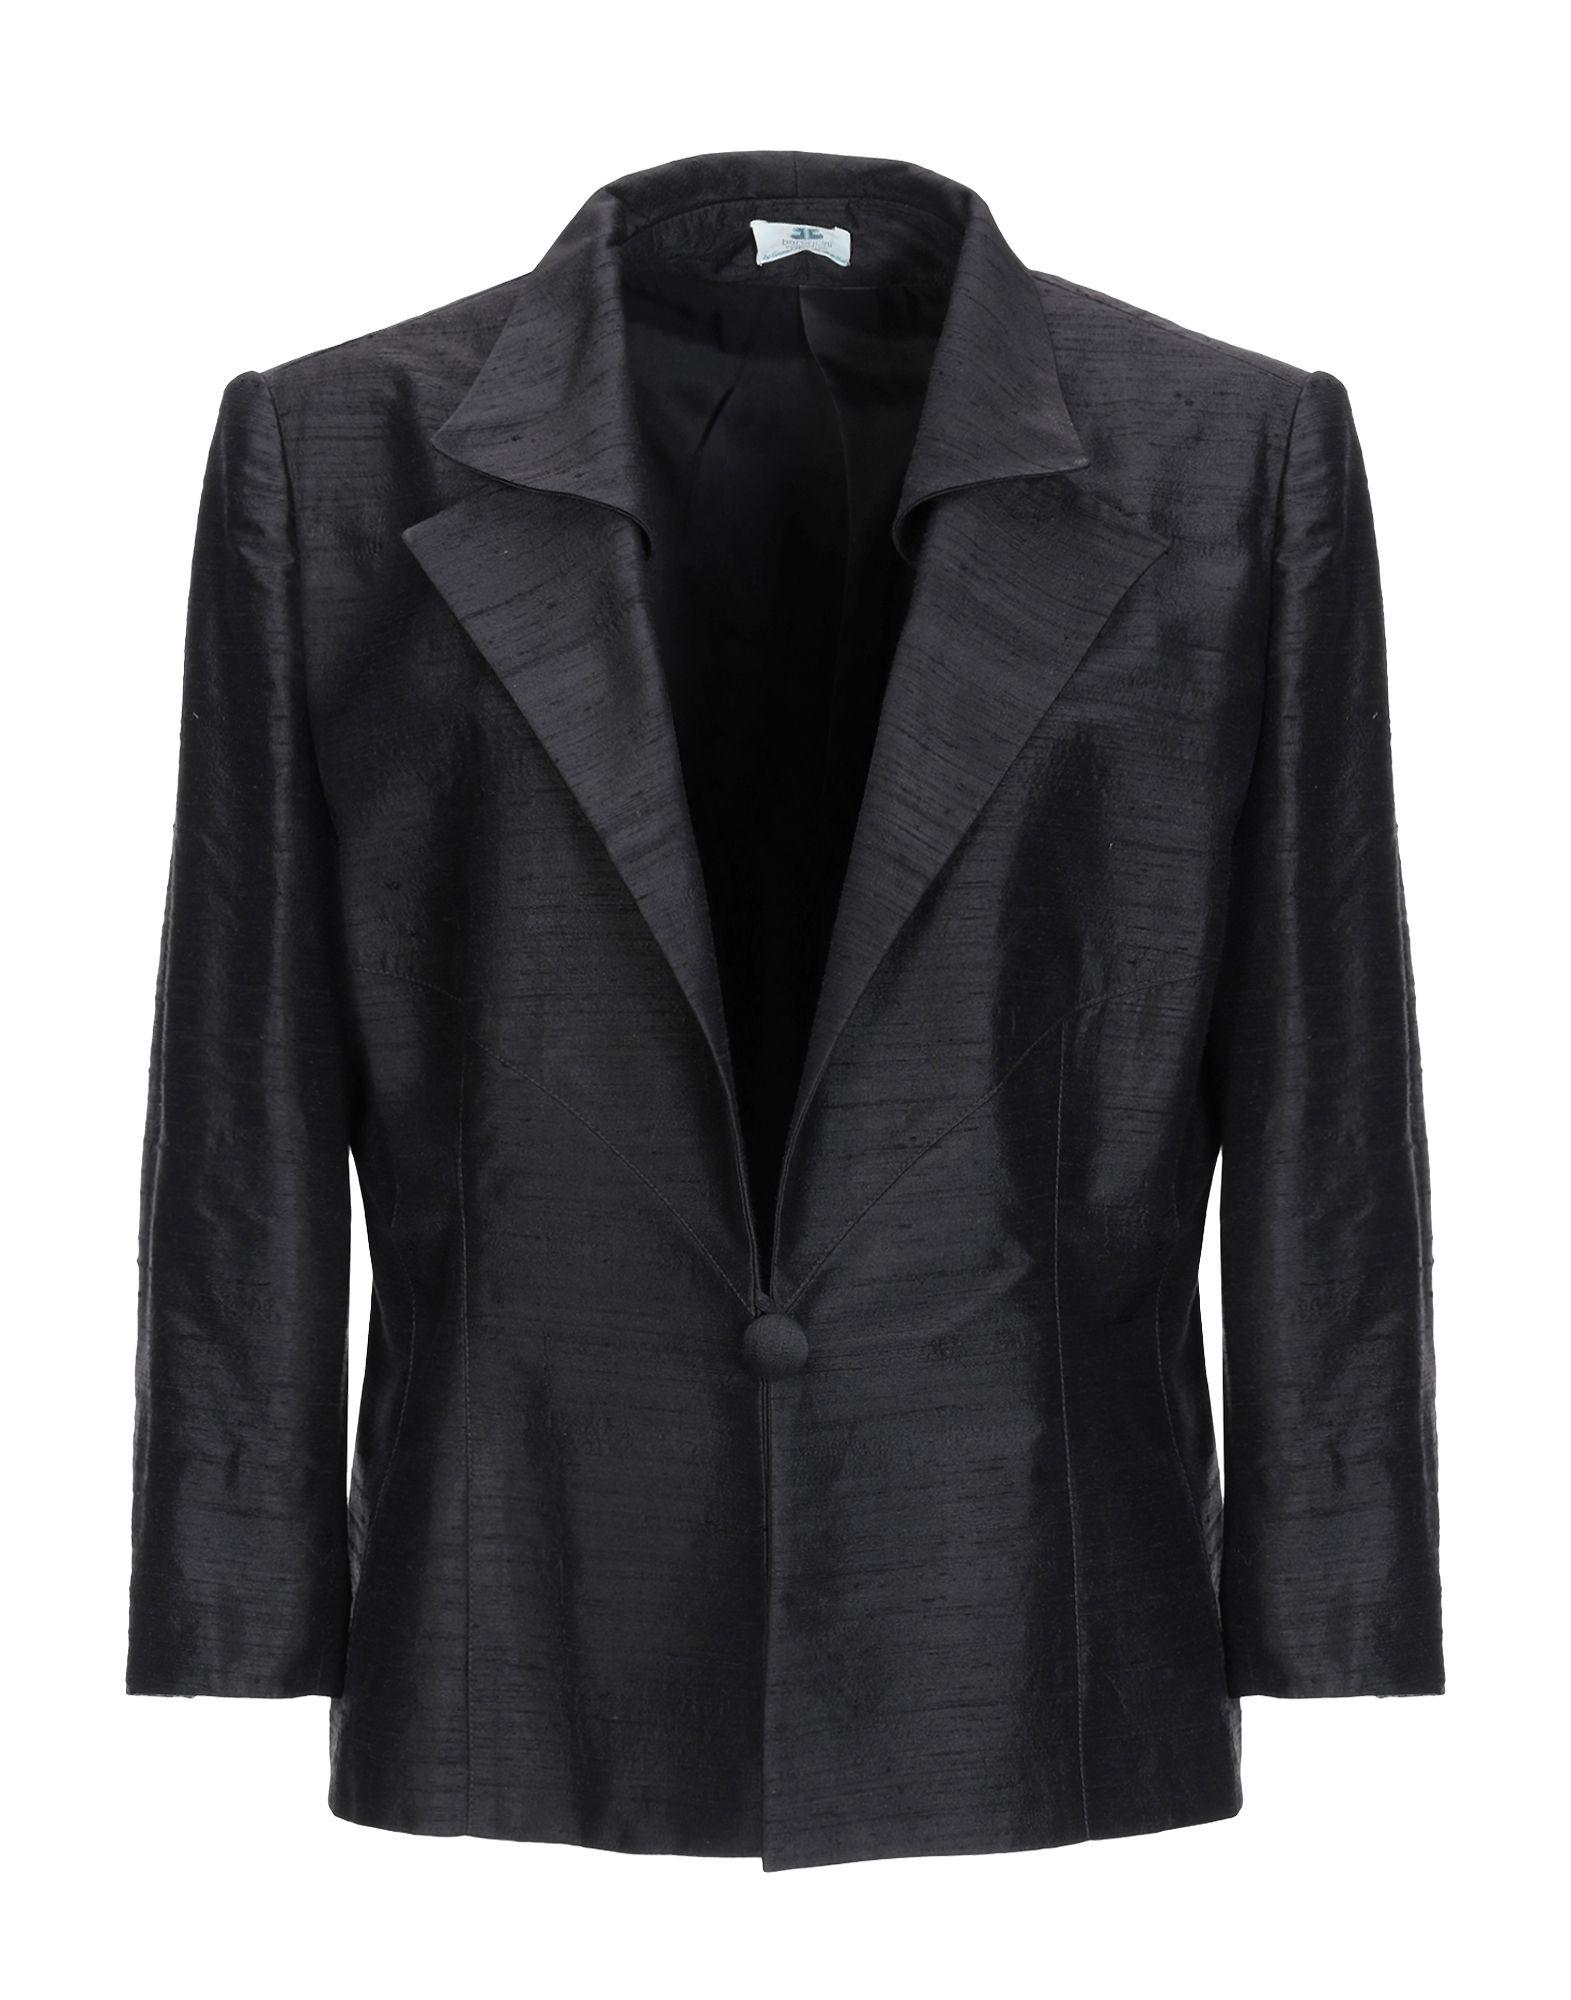 BARONCINI COLLECTION Пиджак lady chic® collection пиджак